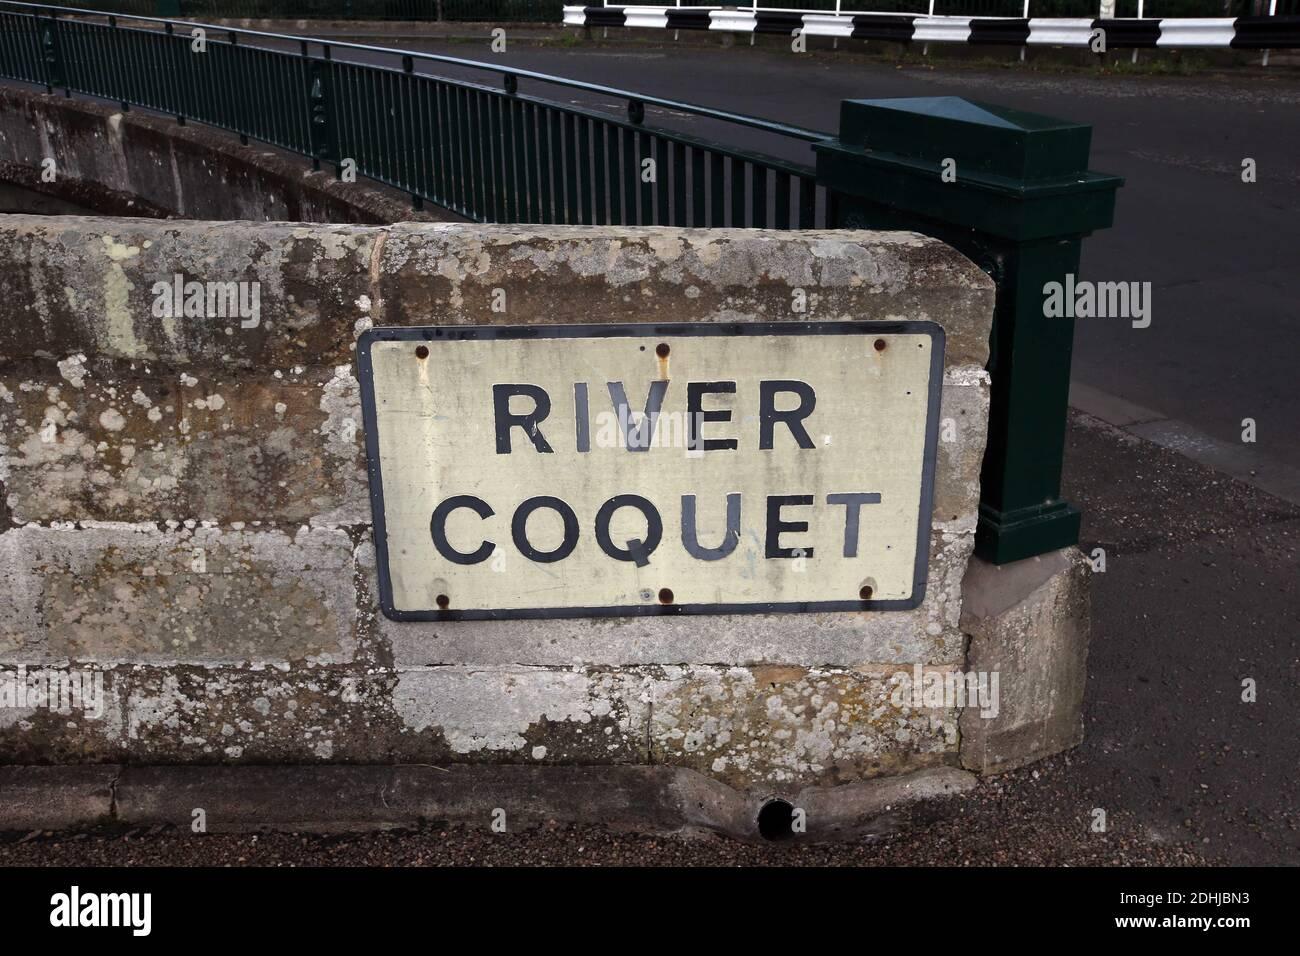 Le Coquet de la rivière à Felton.Samedi 3 octobre 2020. Banque D'Images